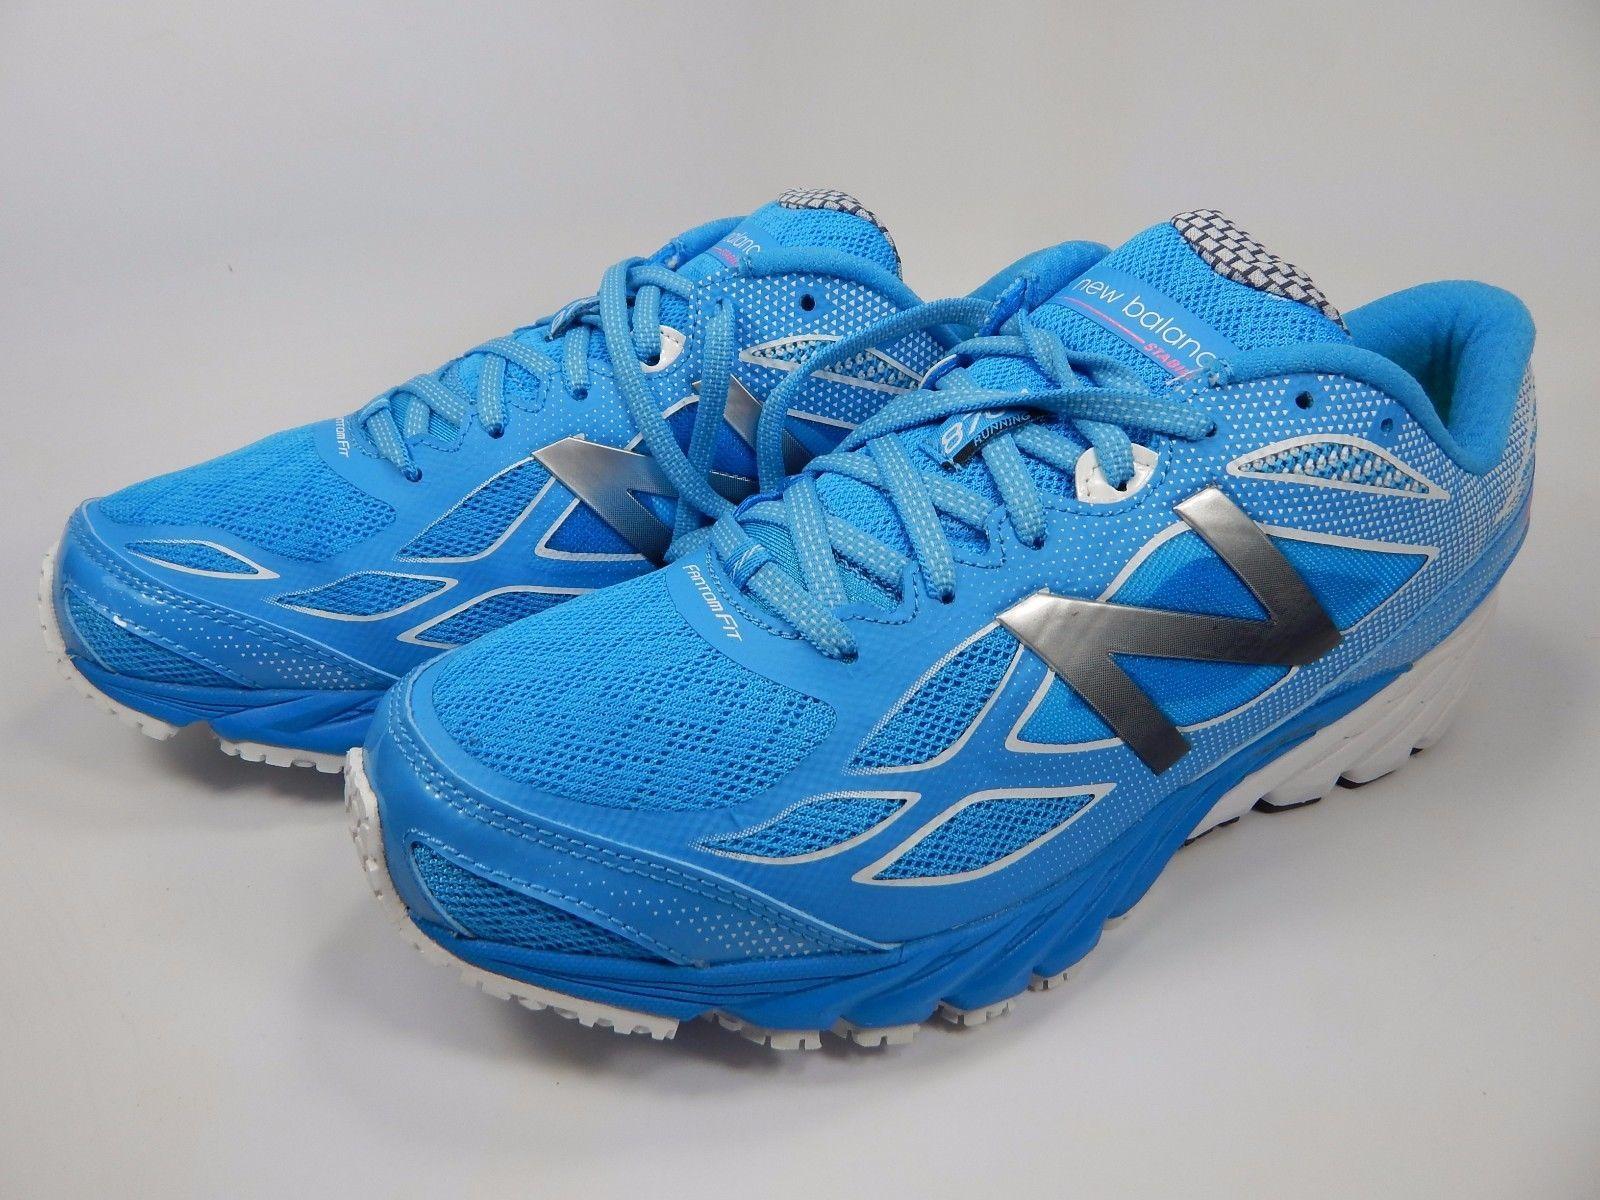 New Balance 870 v4 Women's Running Shoes Size US 11 M (B) EU 43 Blue W870BW4